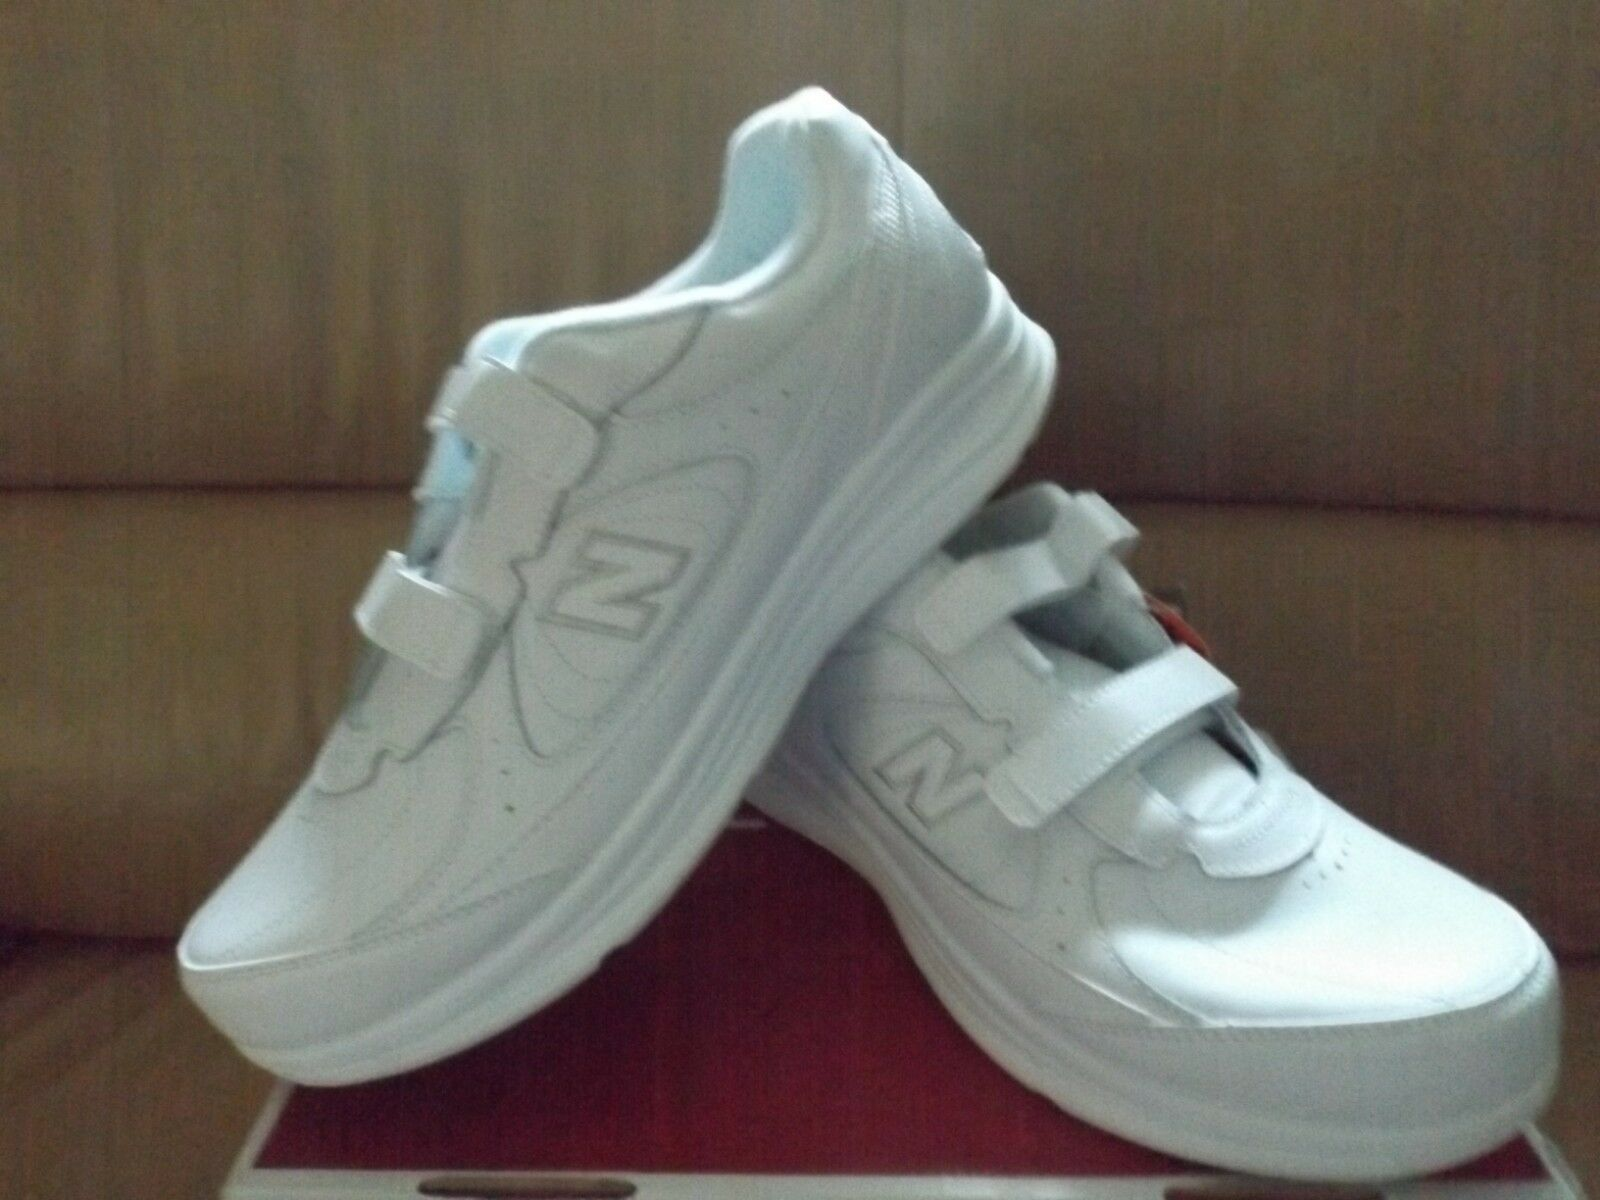 New Balance 577 MW577VW Men's Size 13 (4E XWide) Walking shoes White Leather NEW